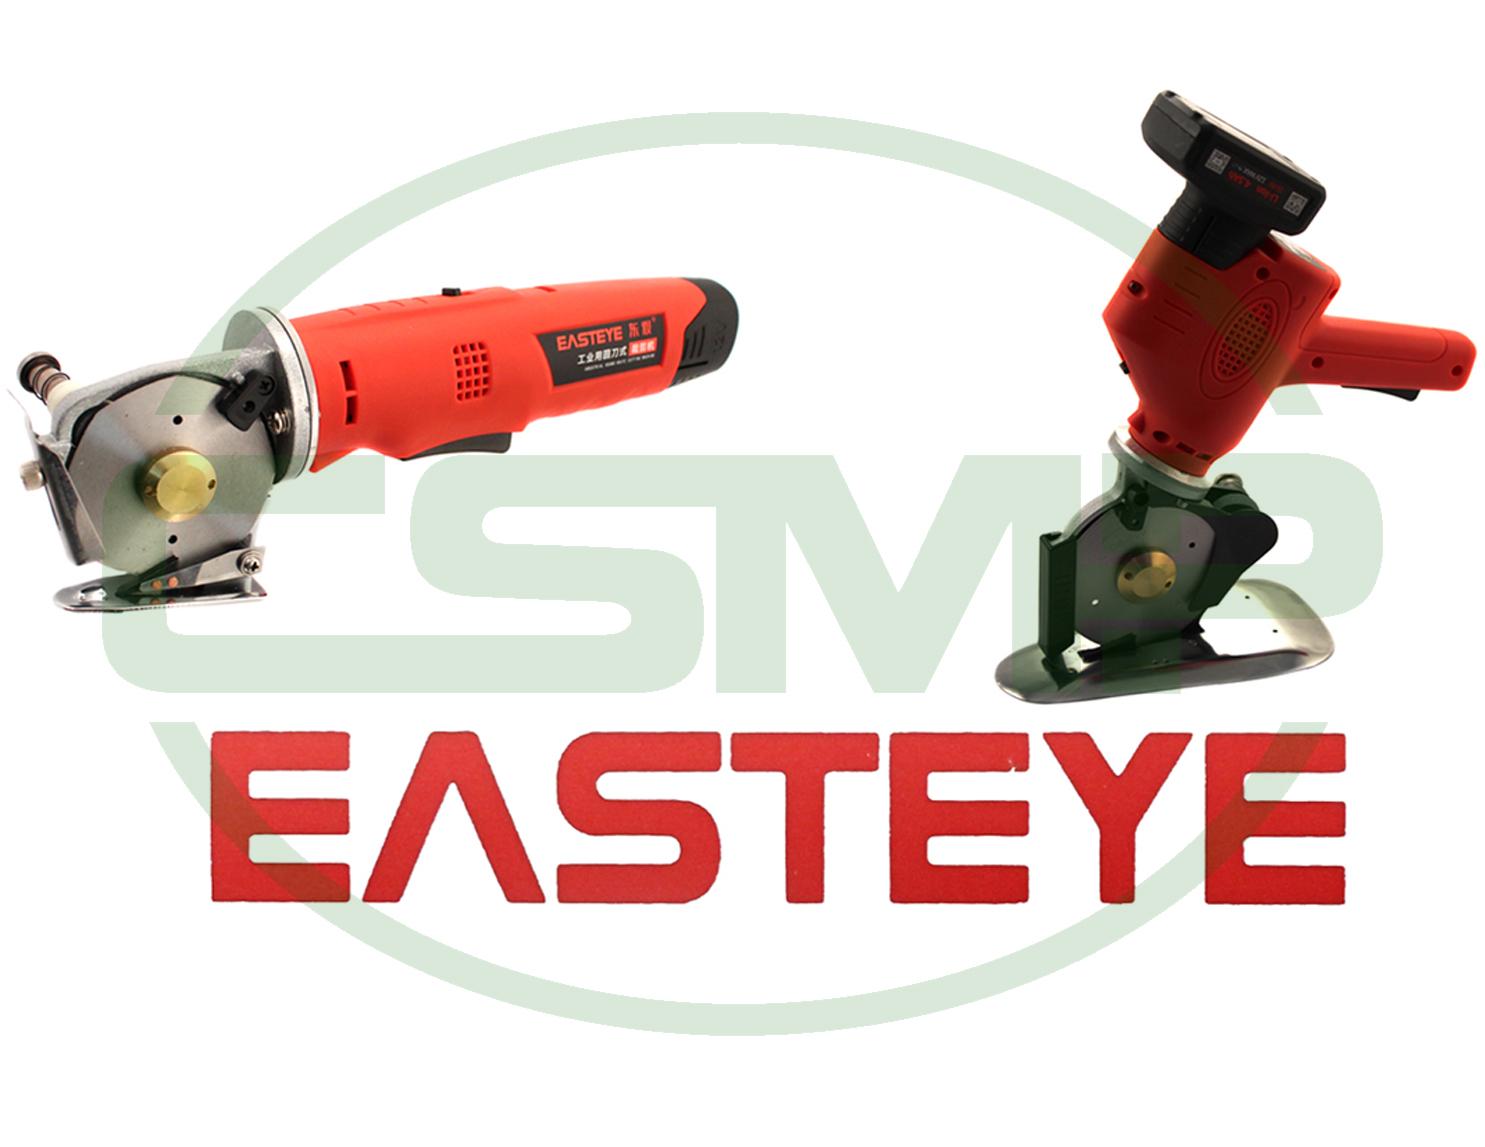 Easteye Cutting Machines